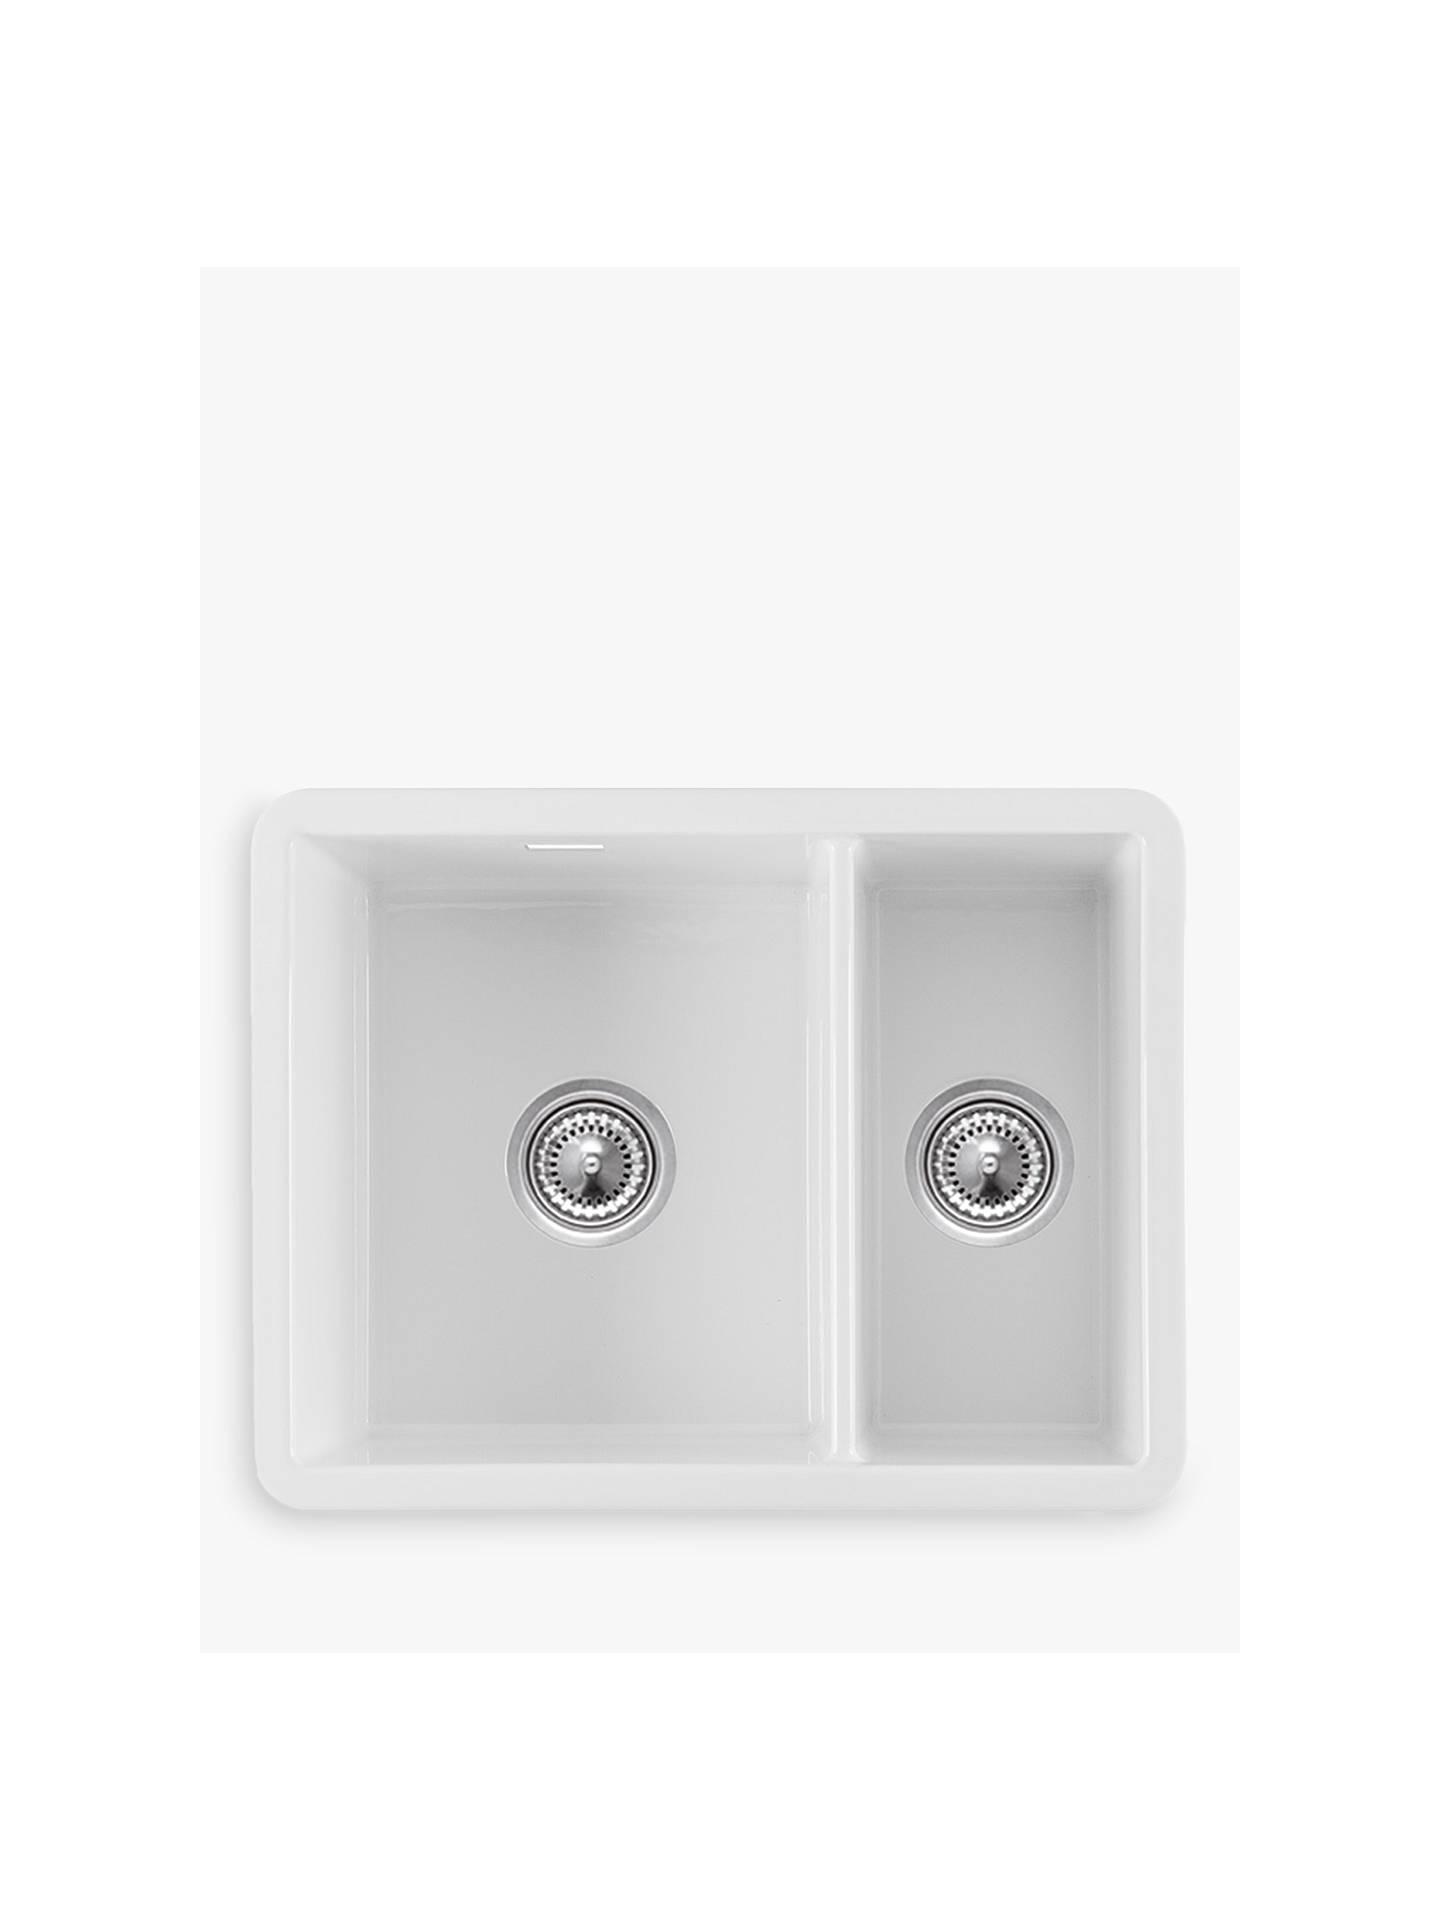 Buyclearwater metro 1 5 bowl ceramic kitchen sink white online at johnlewis com